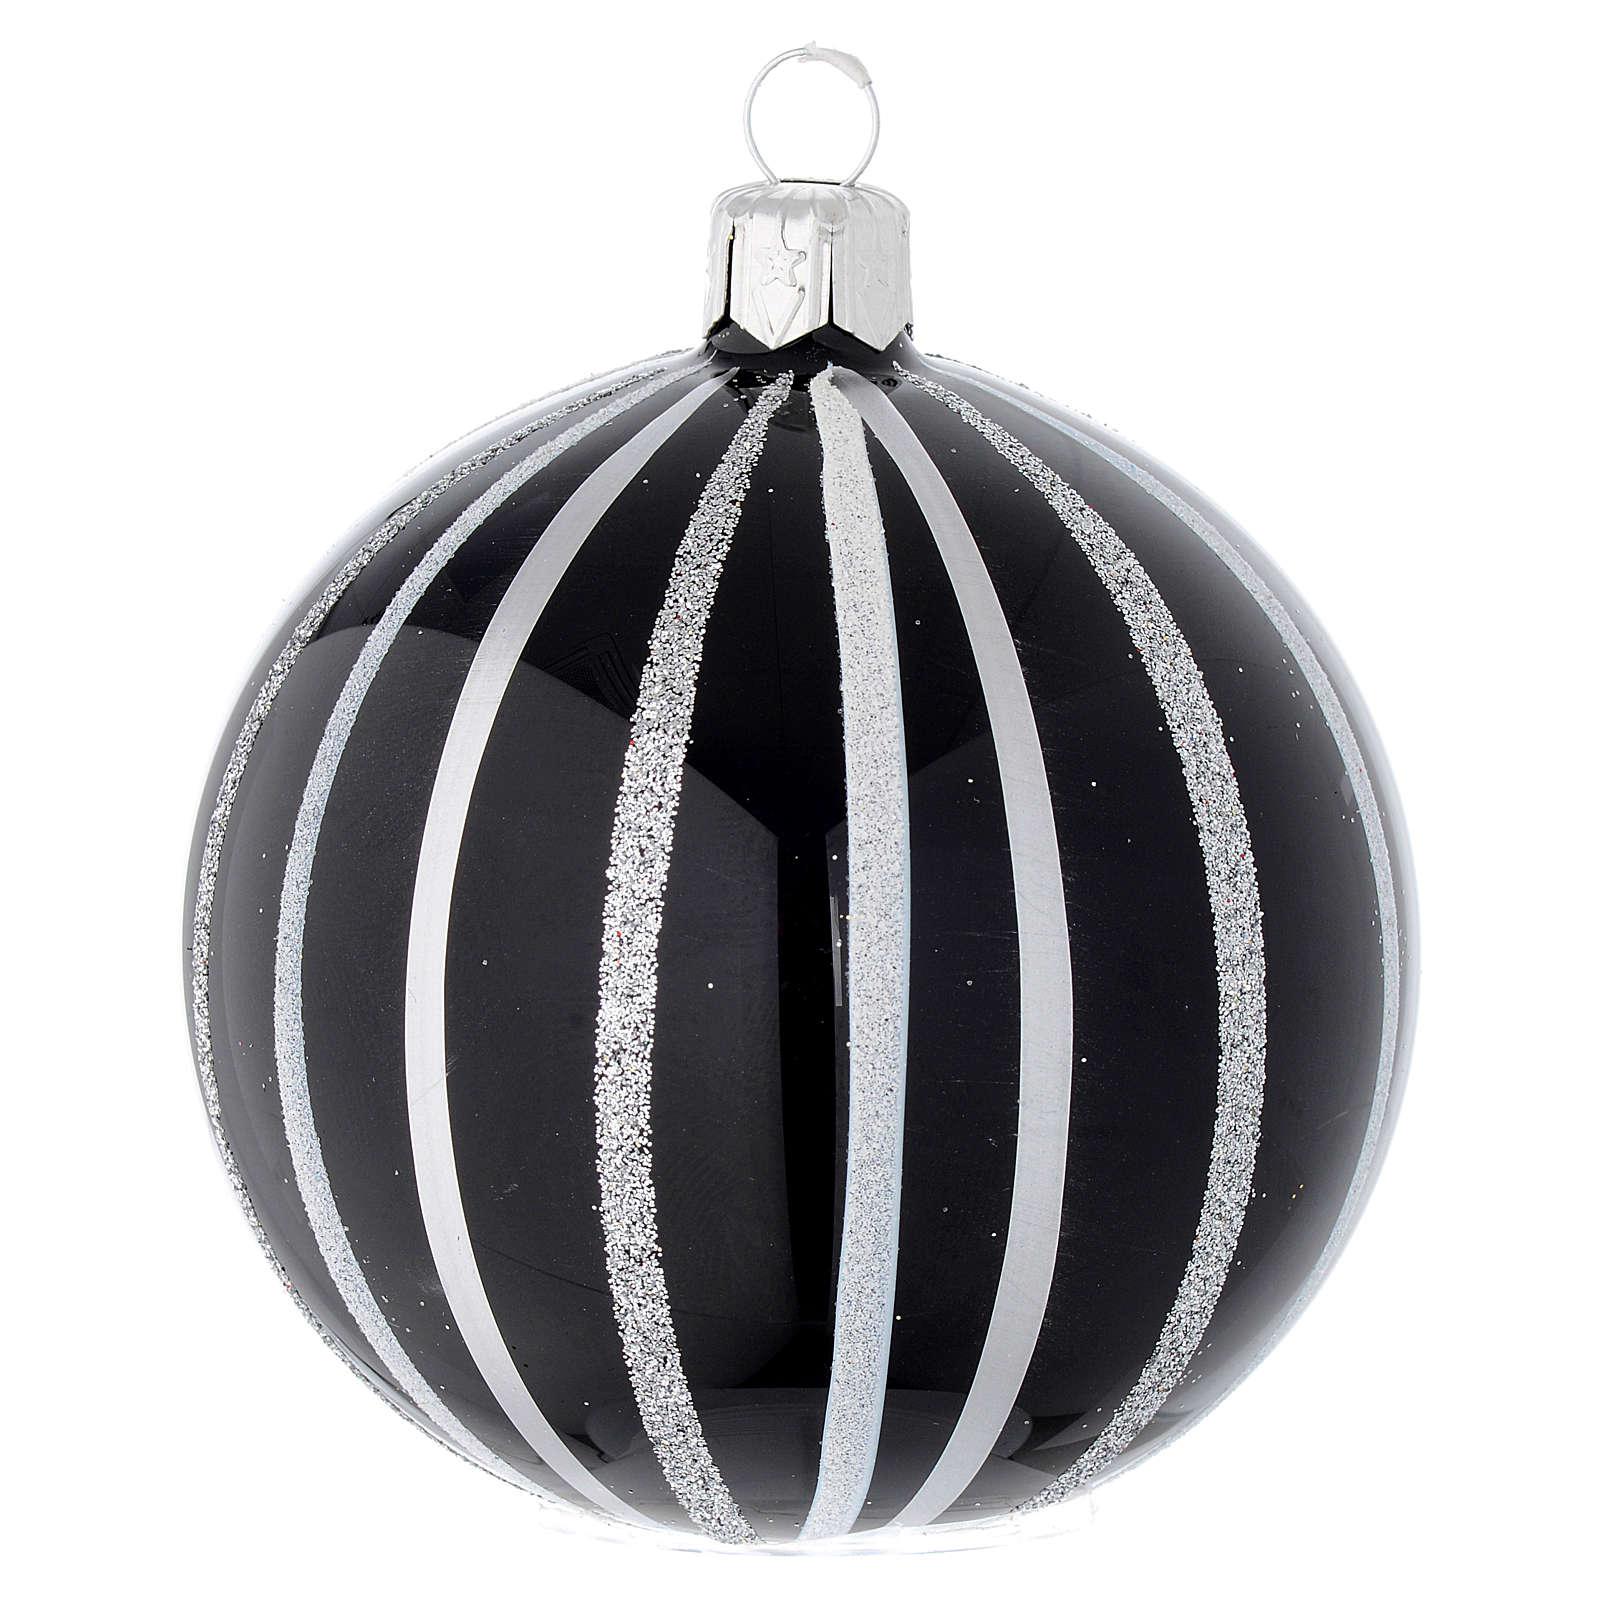 Pallina Natale vetro nero righe argento 80 mm 4